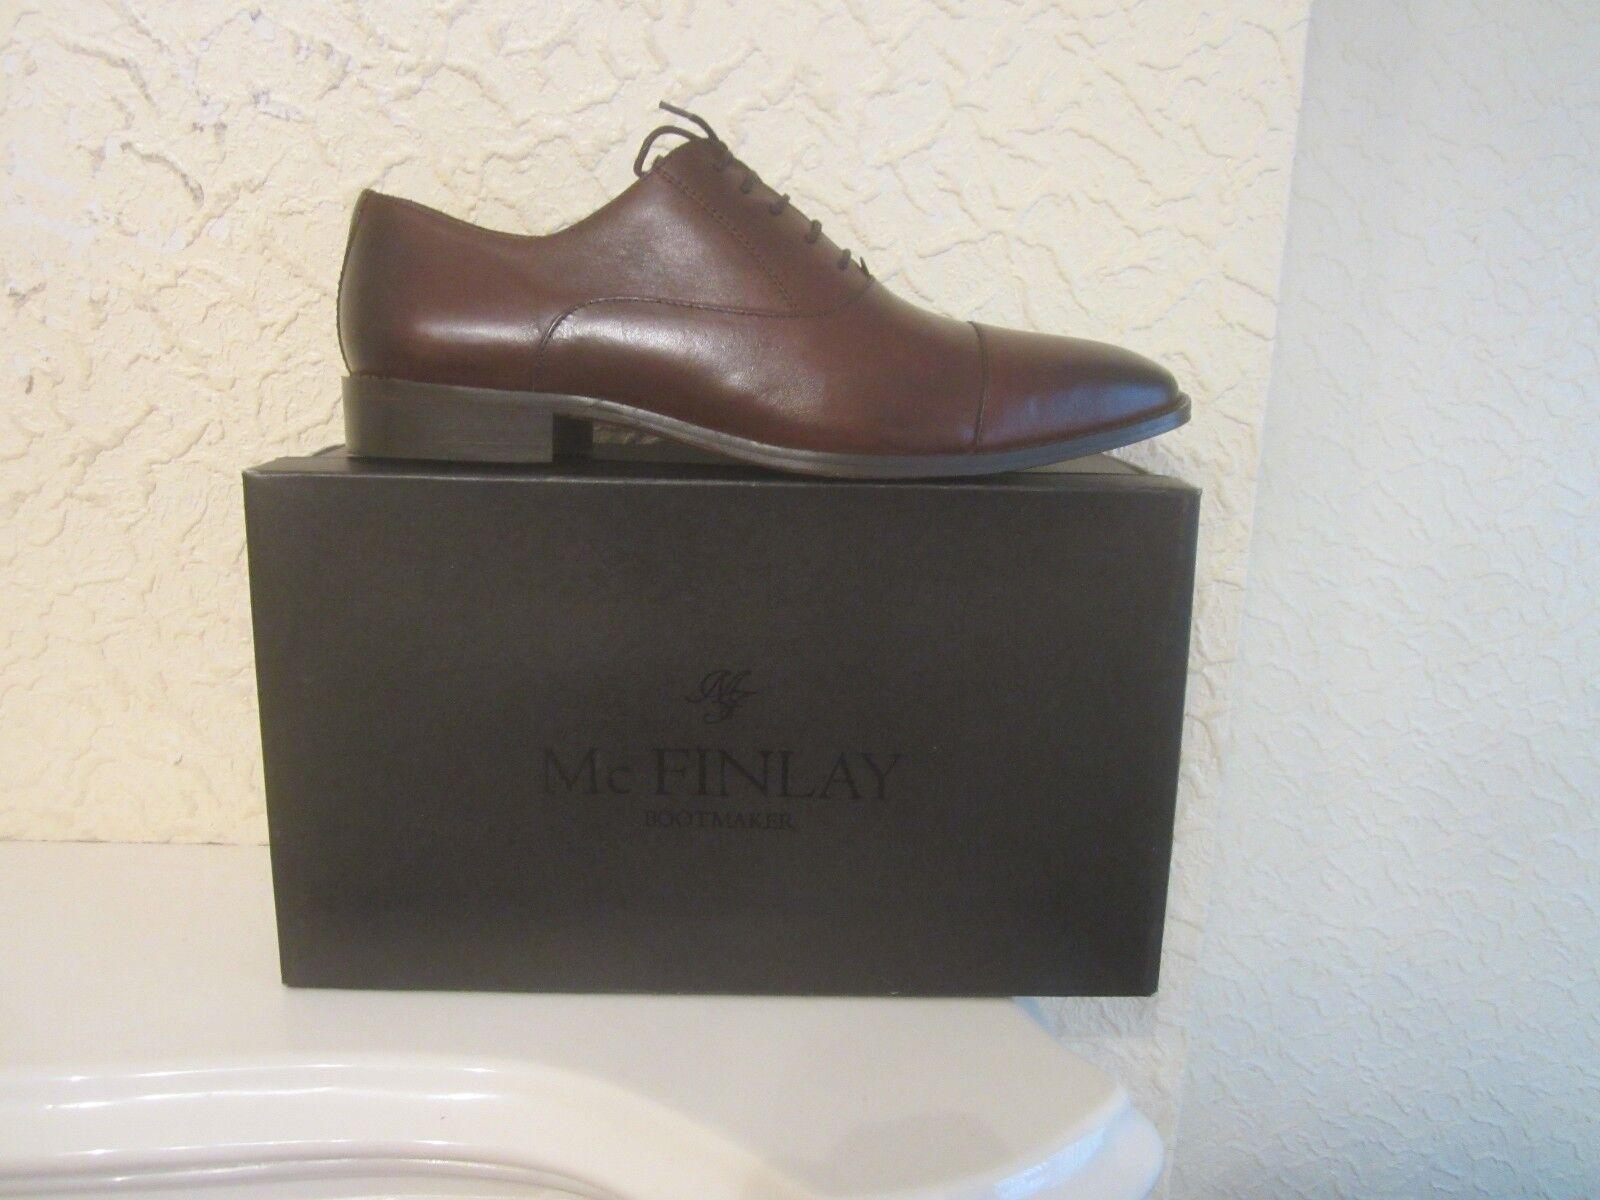 McFinlay McFinlay McFinlay Braun Burnished Leder Oxford Schuhes fcc074